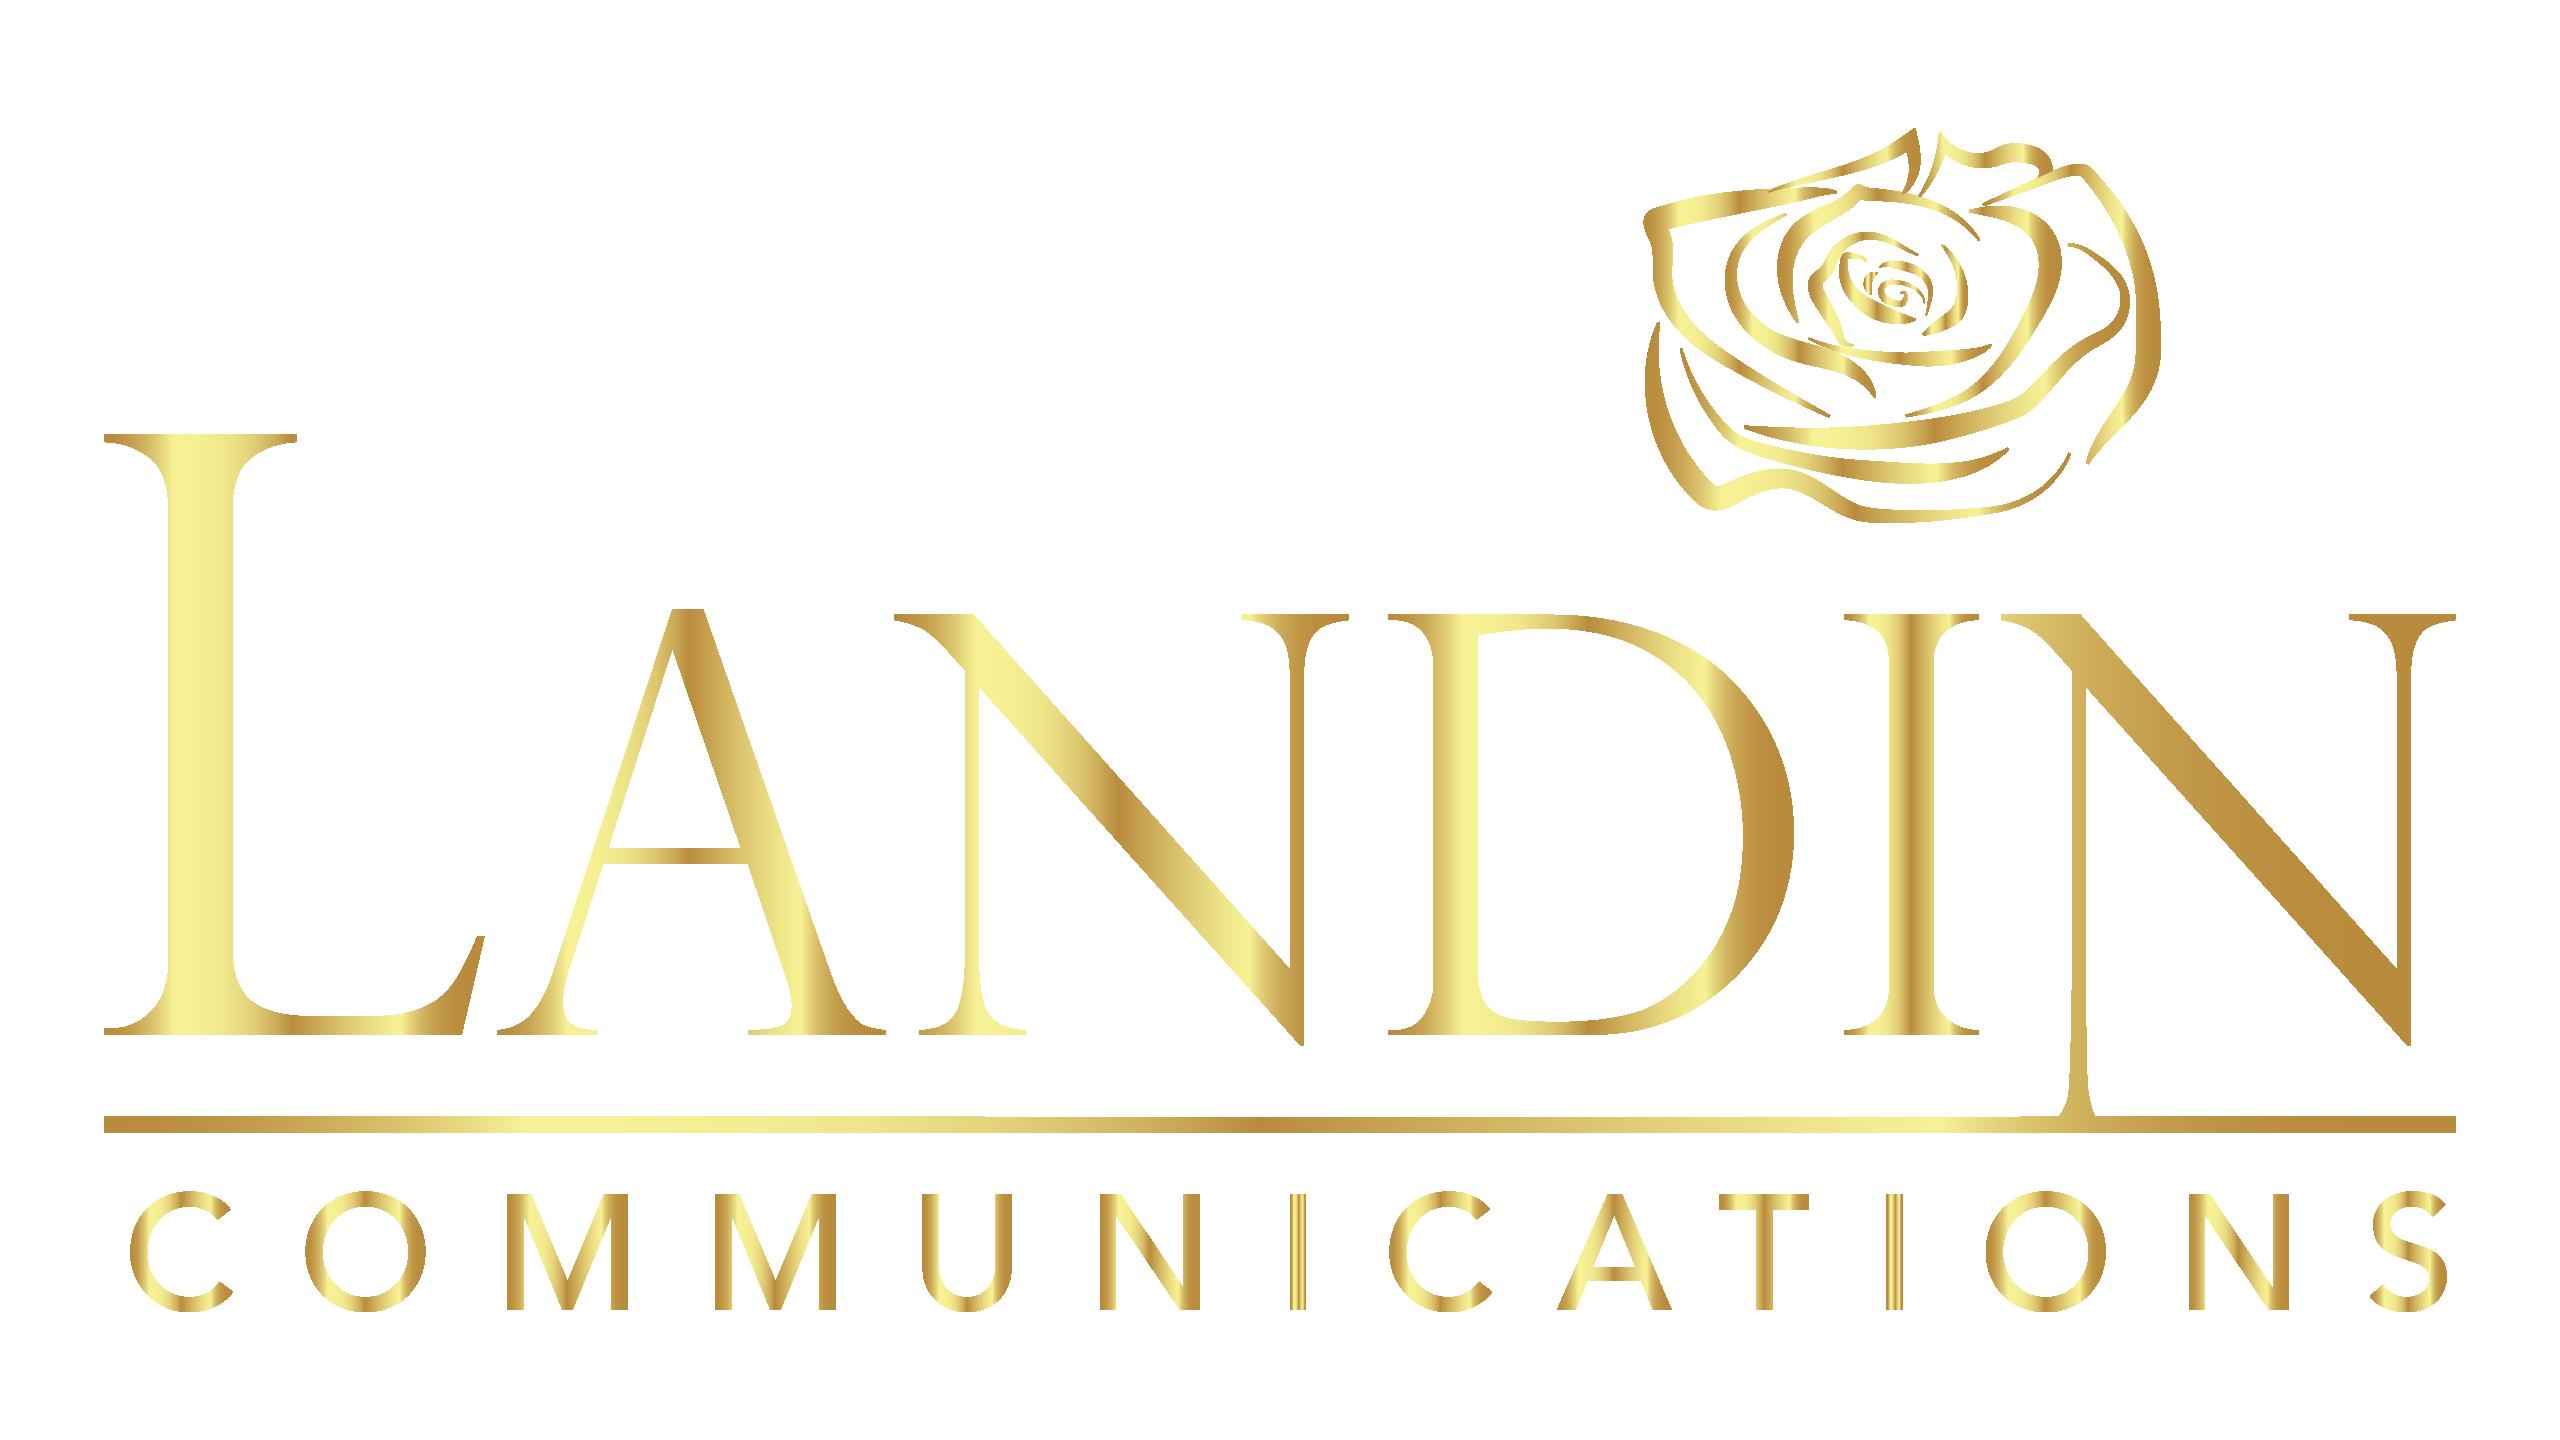 Landin Communications